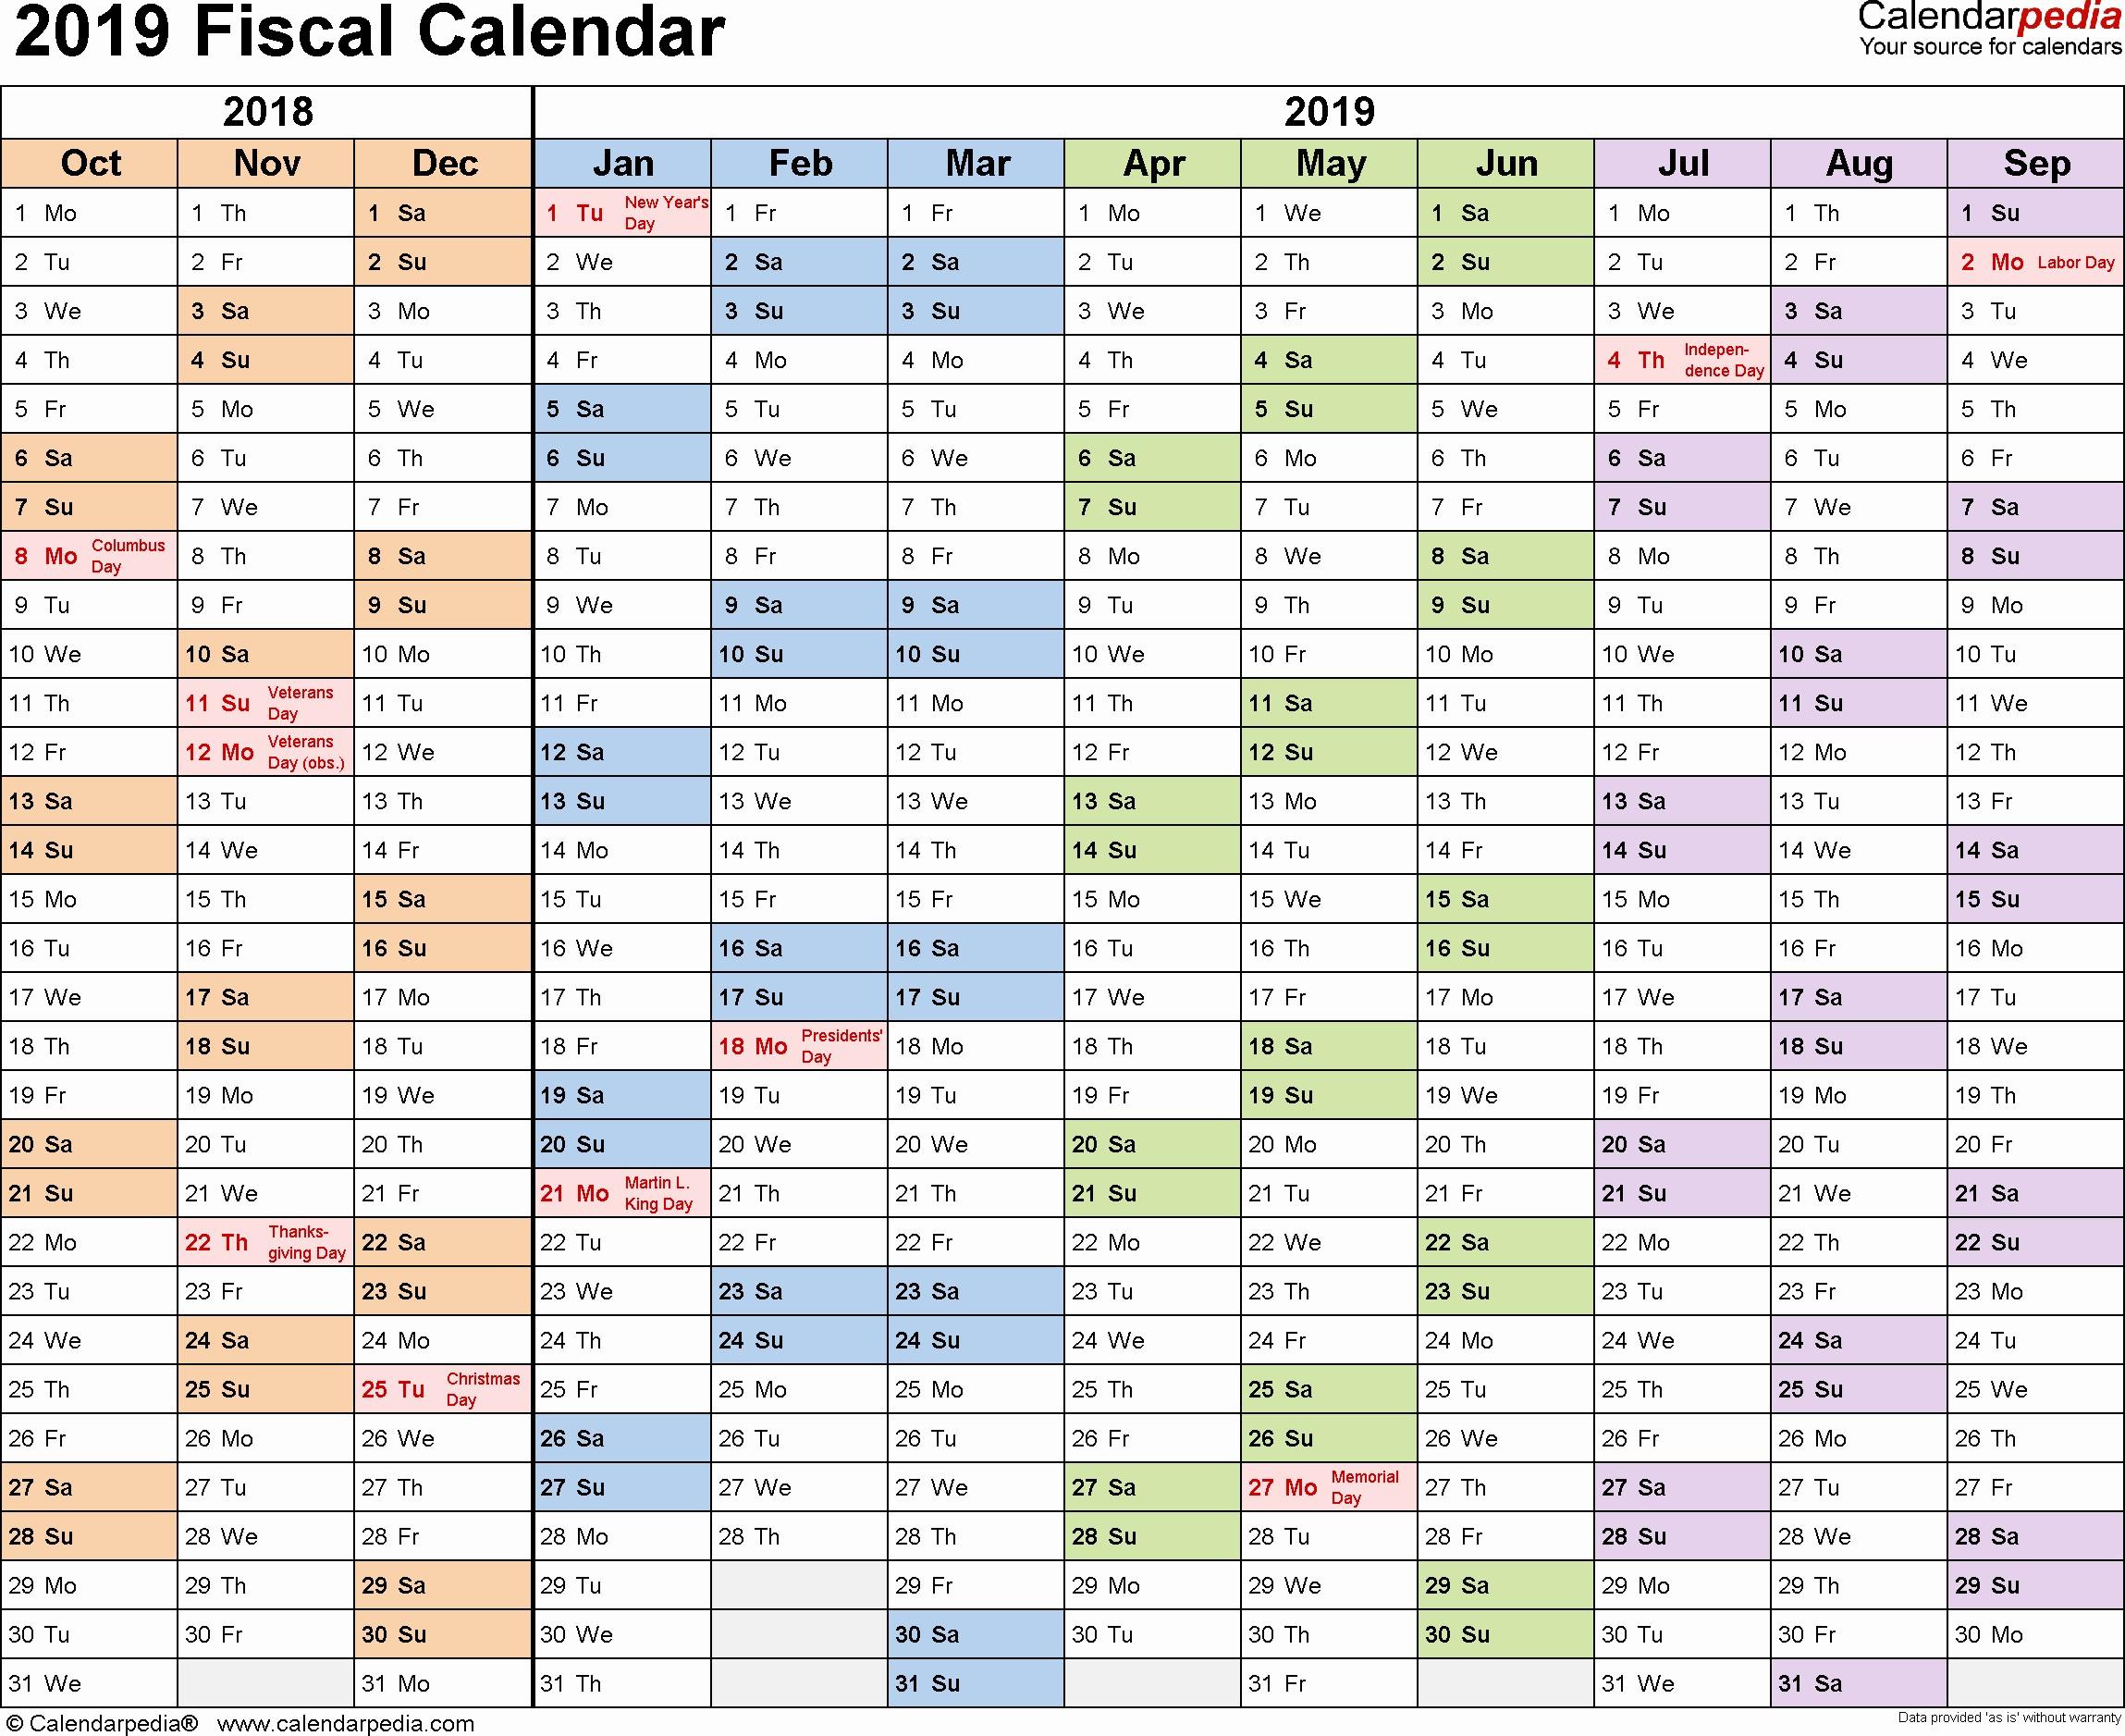 Bill Payment Schedule Template Best Fiscal Calendars 2019 as Free